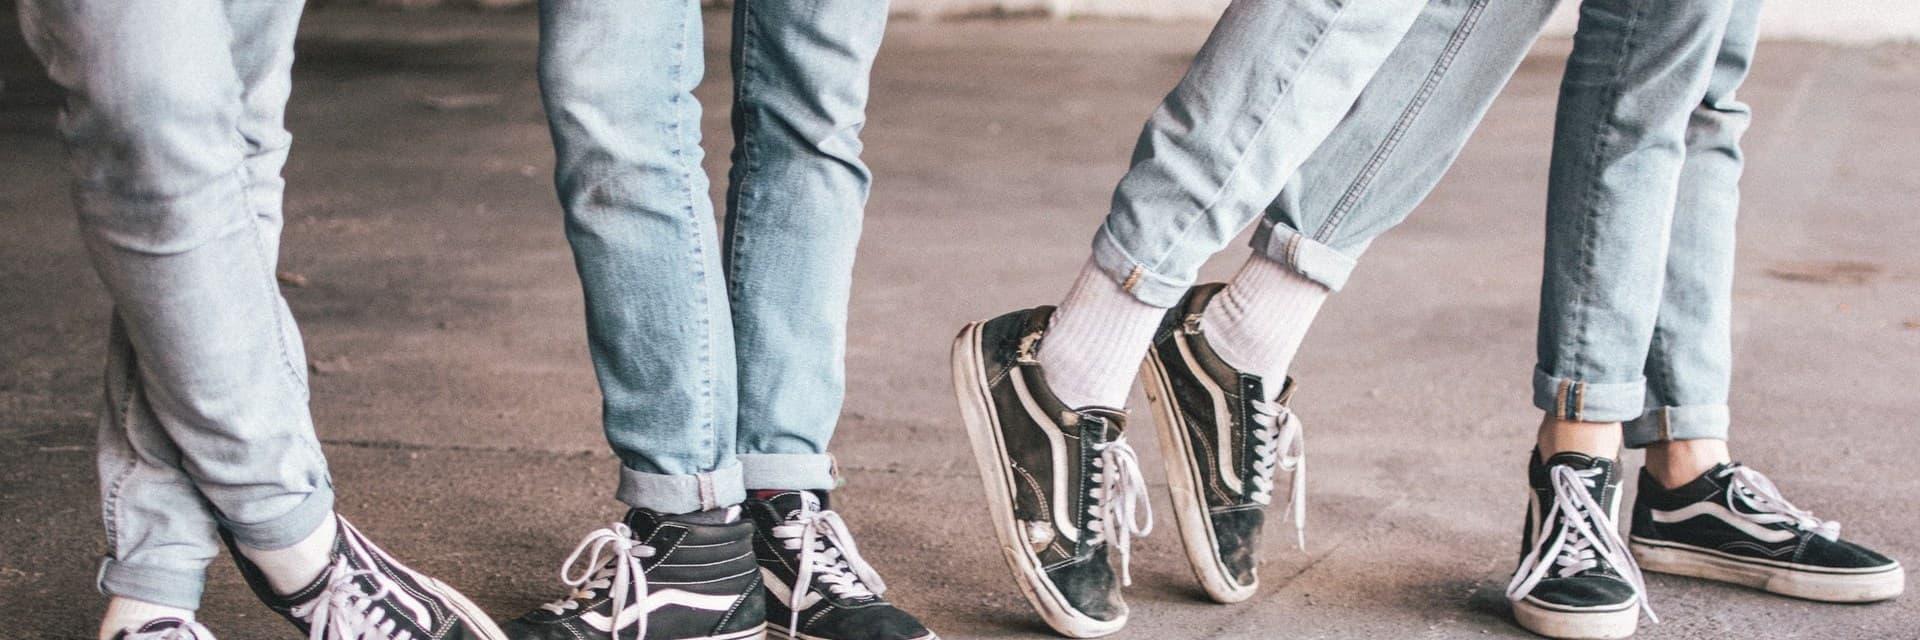 fabb fashion vintage jeans